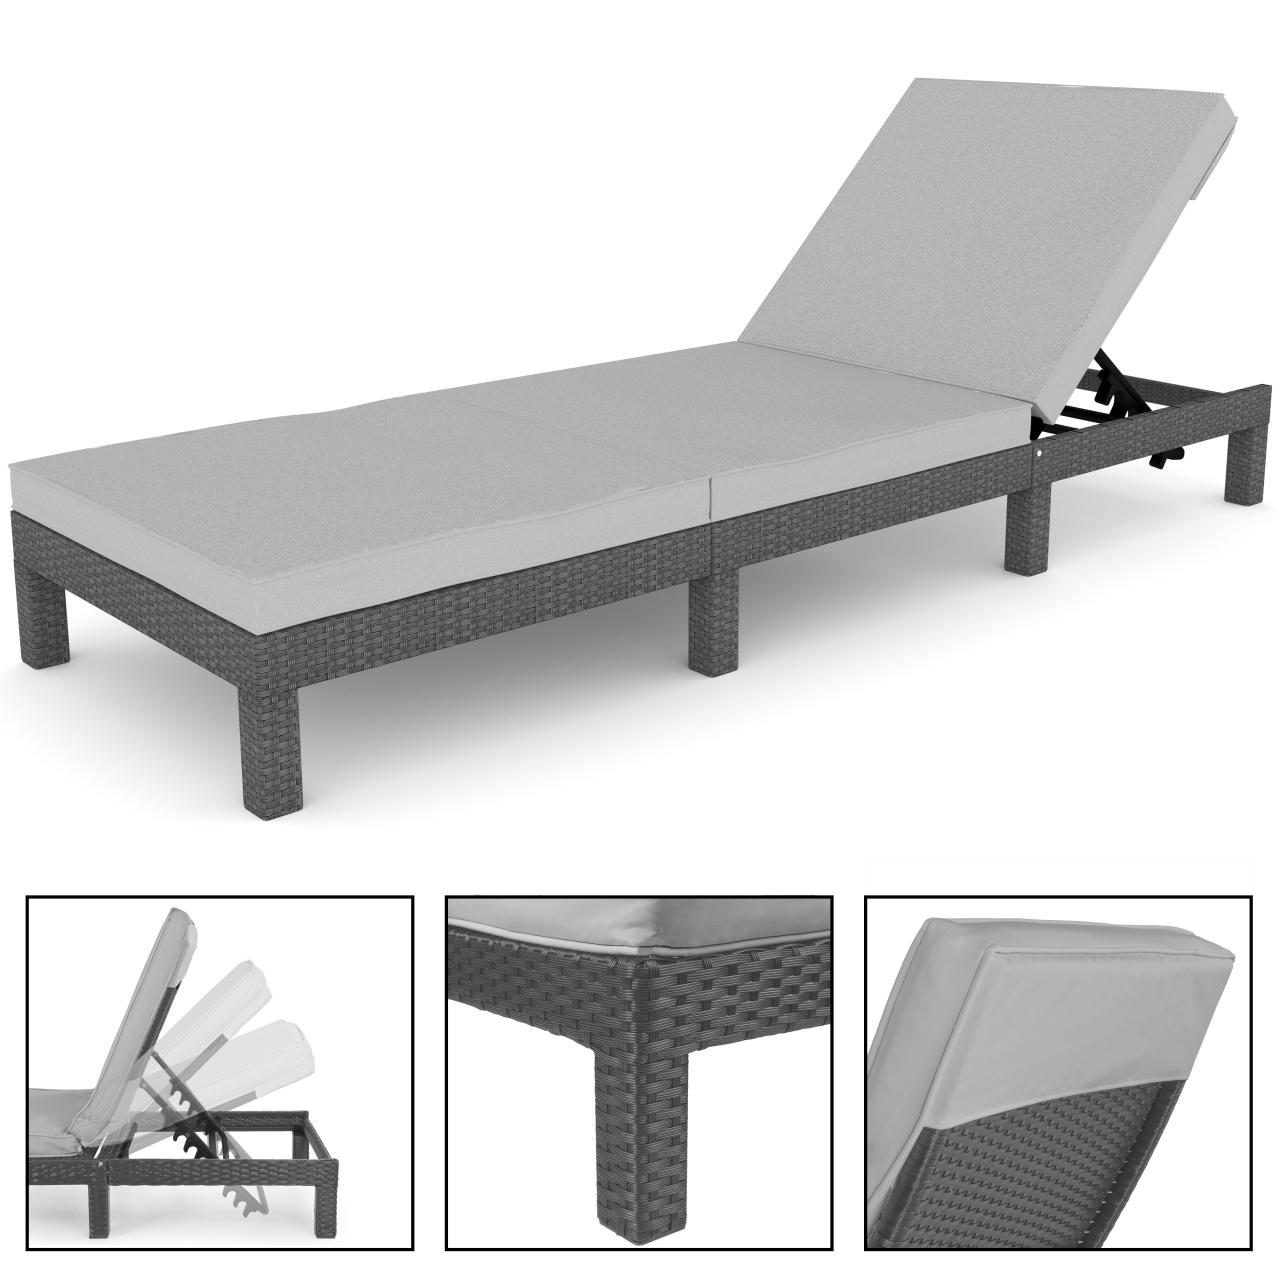 polyrattan sonnenliege garten liege rattan gartenm bel gartenliege rattanm bel ebay. Black Bedroom Furniture Sets. Home Design Ideas